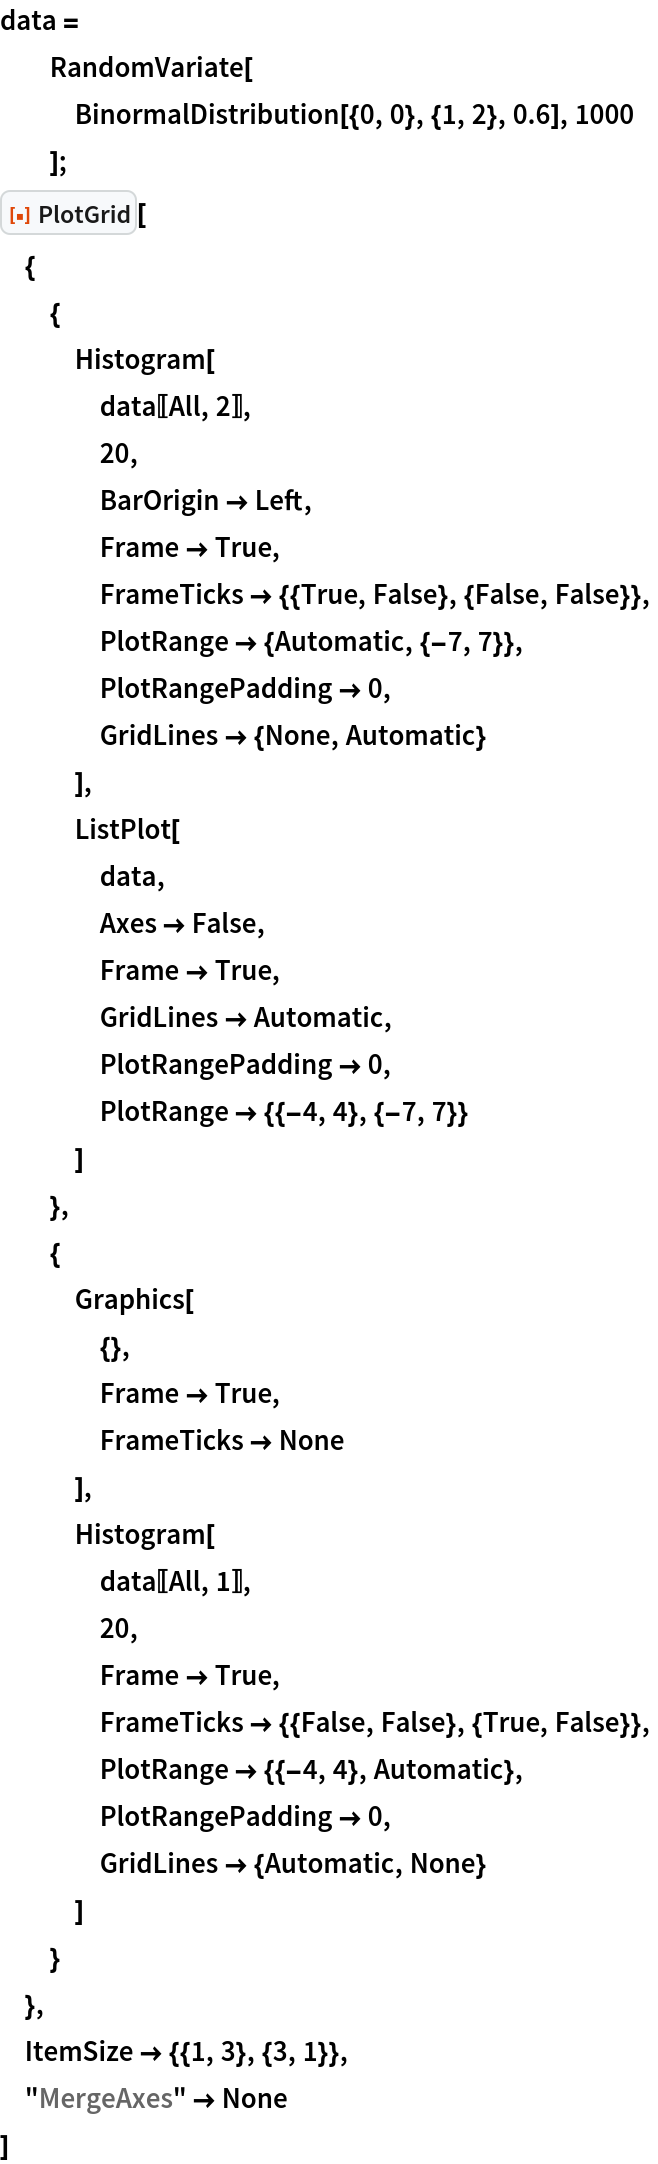 "data =   RandomVariate[    BinormalDistribution[{0, 0}, {1, 2}, 0.6], 1000    ]; ResourceFunction[""PlotGrid""][  {   {    Histogram[     data[[All, 2]],     20,     BarOrigin -> Left,     Frame -> True,     FrameTicks -> {{True, False}, {False, False}},     PlotRange -> {Automatic, {-7, 7}},     PlotRangePadding -> 0,     GridLines -> {None, Automatic}     ],    ListPlot[     data,     Axes -> False,     Frame -> True,     GridLines -> Automatic,     PlotRangePadding -> 0,     PlotRange -> {{-4, 4}, {-7, 7}}     ]    },   {    Graphics[     {},     Frame -> True,     FrameTicks -> None     ],    Histogram[     data[[All, 1]],     20,     Frame -> True,     FrameTicks -> {{False, False}, {True, False}},     PlotRange -> {{-4, 4}, Automatic},     PlotRangePadding -> 0,     GridLines -> {Automatic, None}     ]    }   },  ItemSize -> {{1, 3}, {3, 1}},  ""MergeAxes"" -> None  ]"